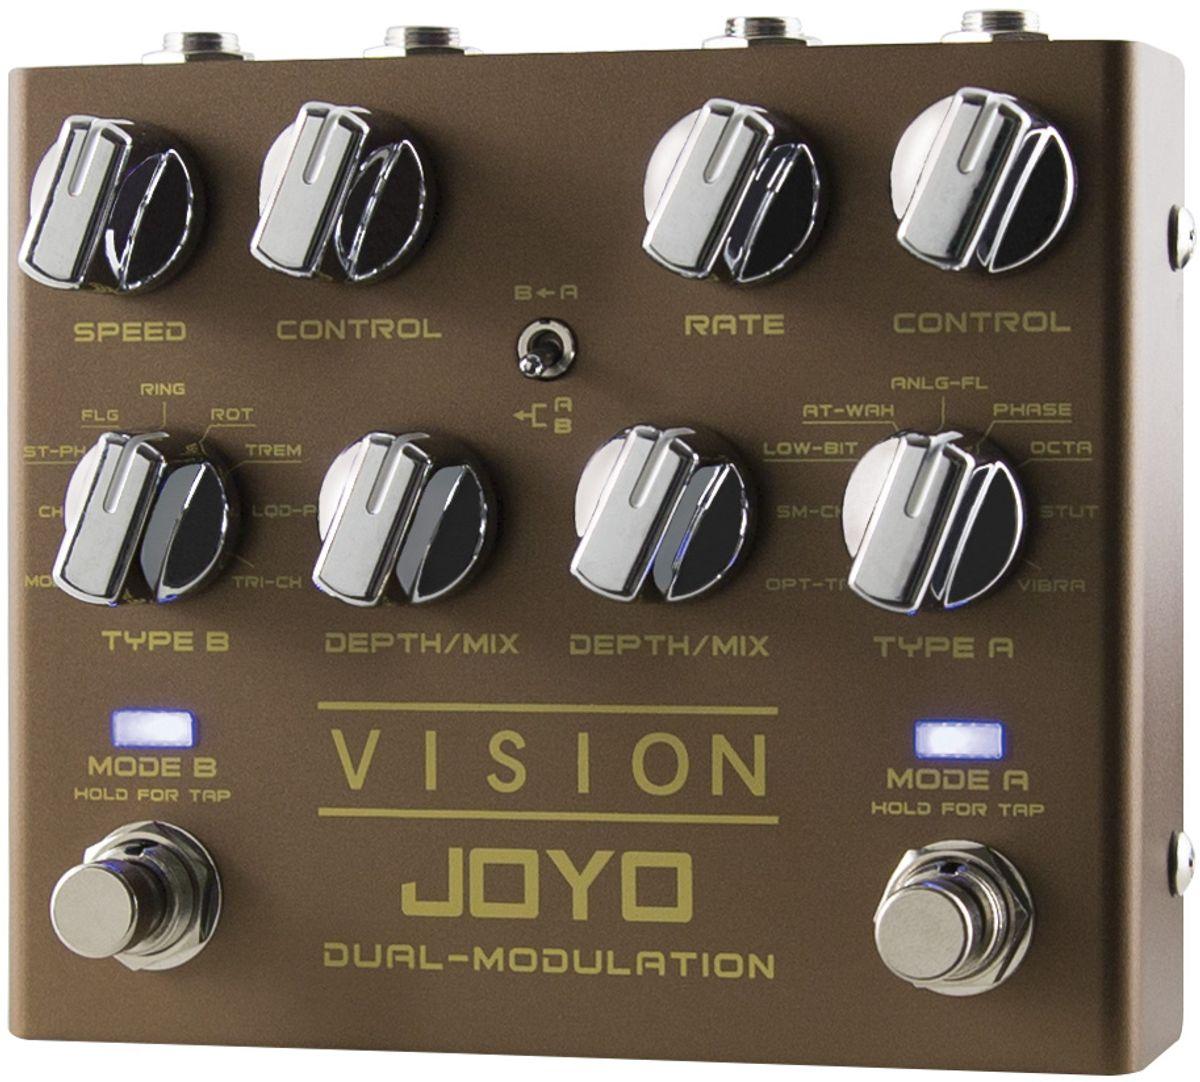 Joyo Vision Dual-Modulation Review